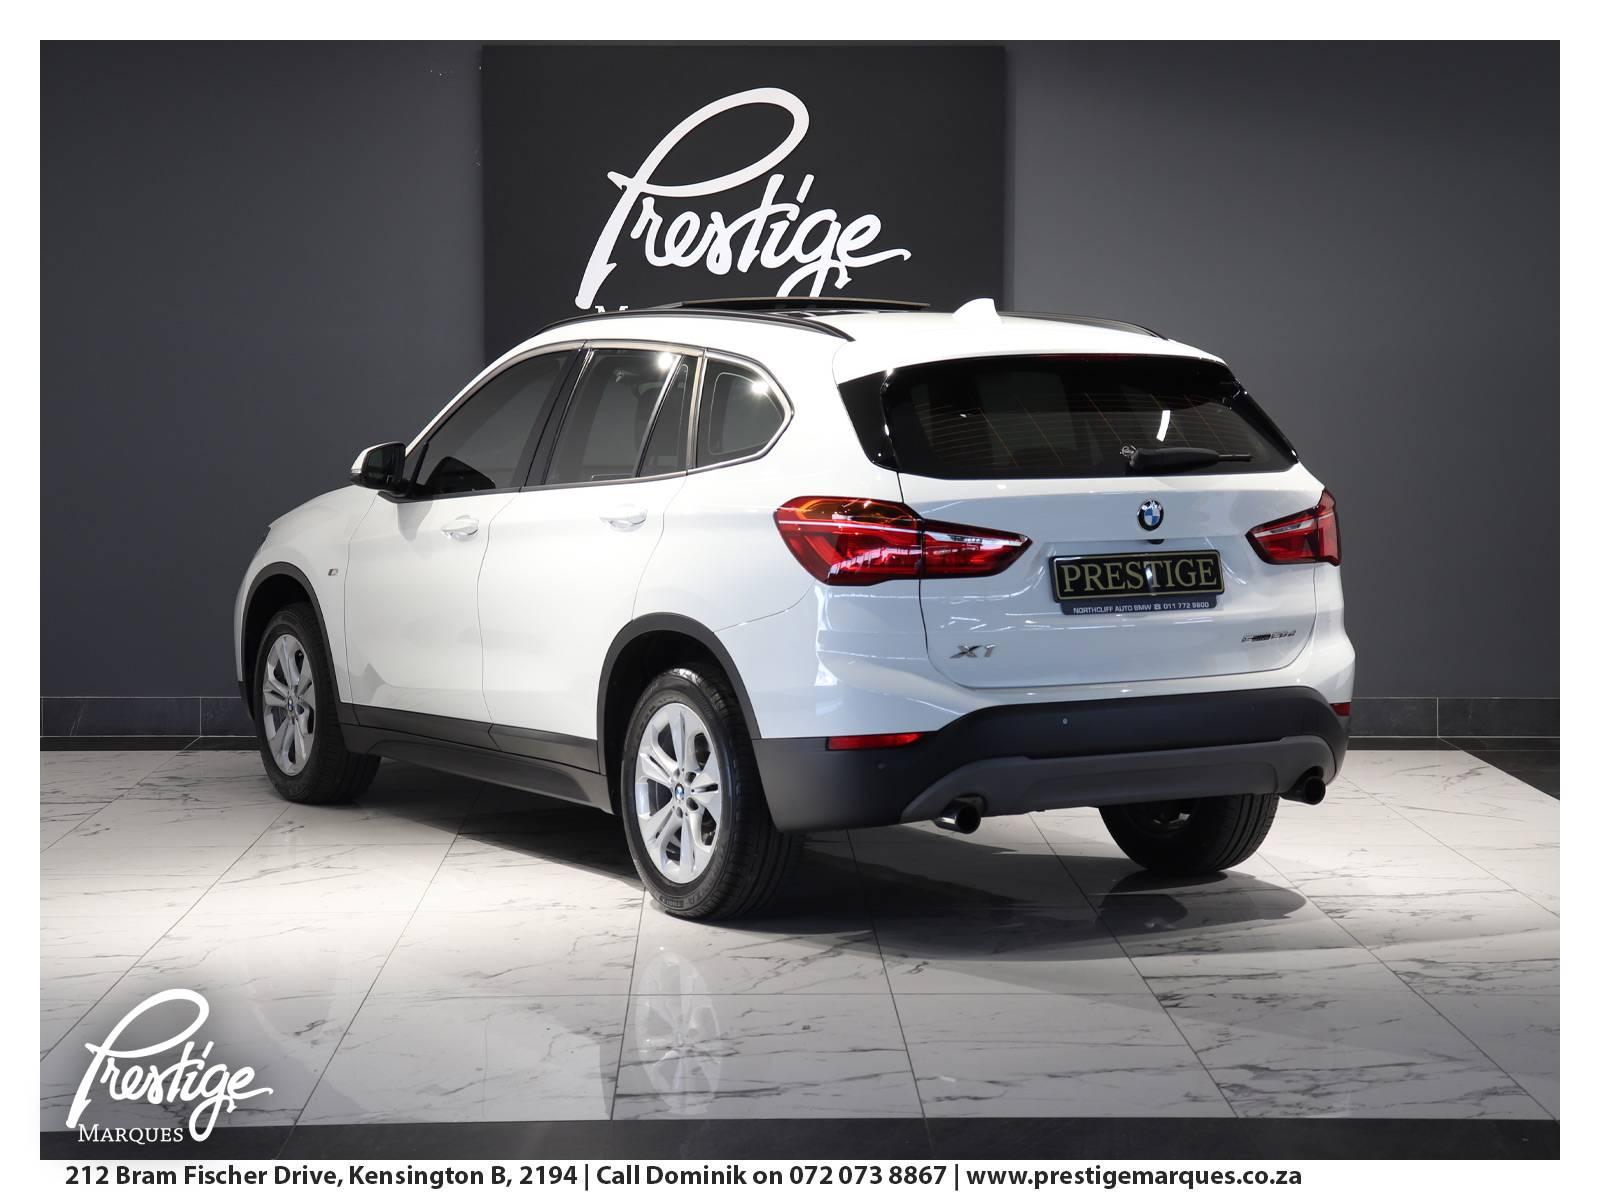 2018-BMW-X1-xDrive-Prestige-Marques-Randburg-Sandton-4